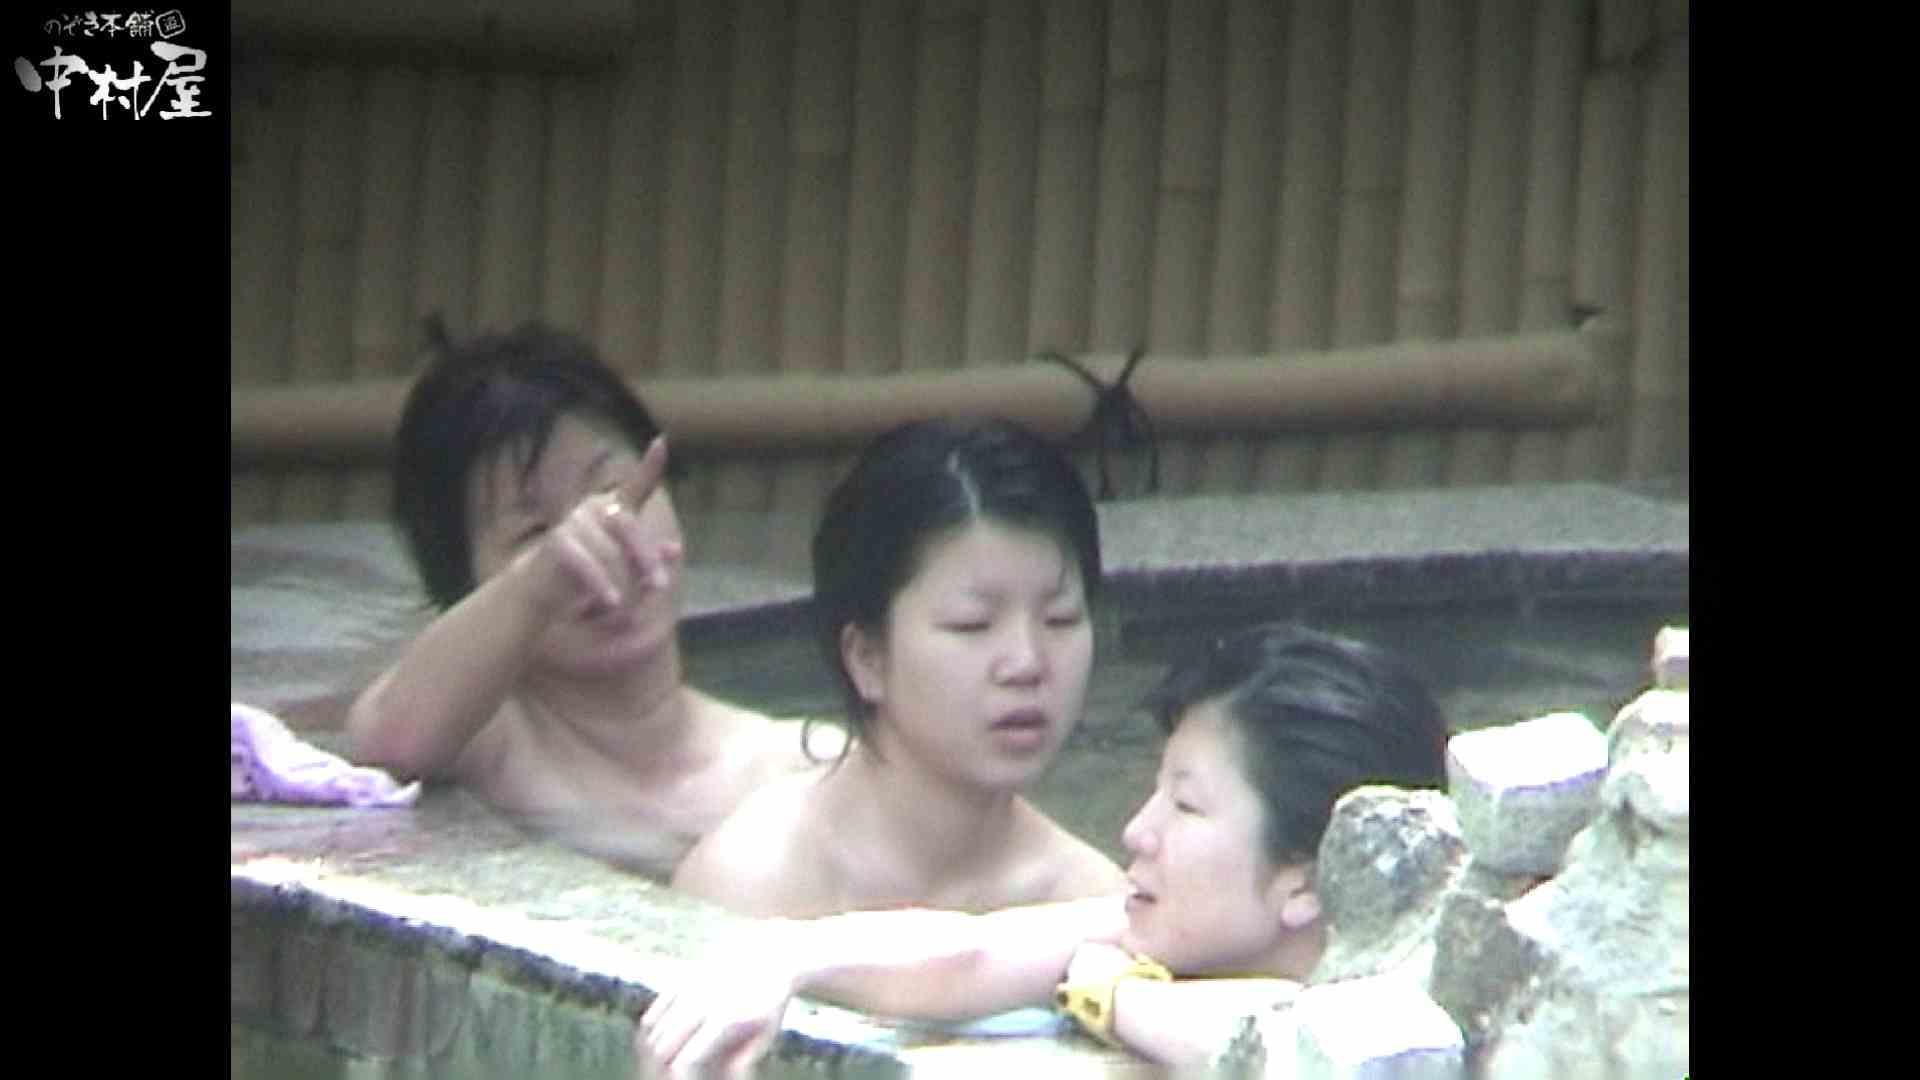 Aquaな露天風呂Vol.936 盗撮シリーズ | 露天風呂編  90PIX 47